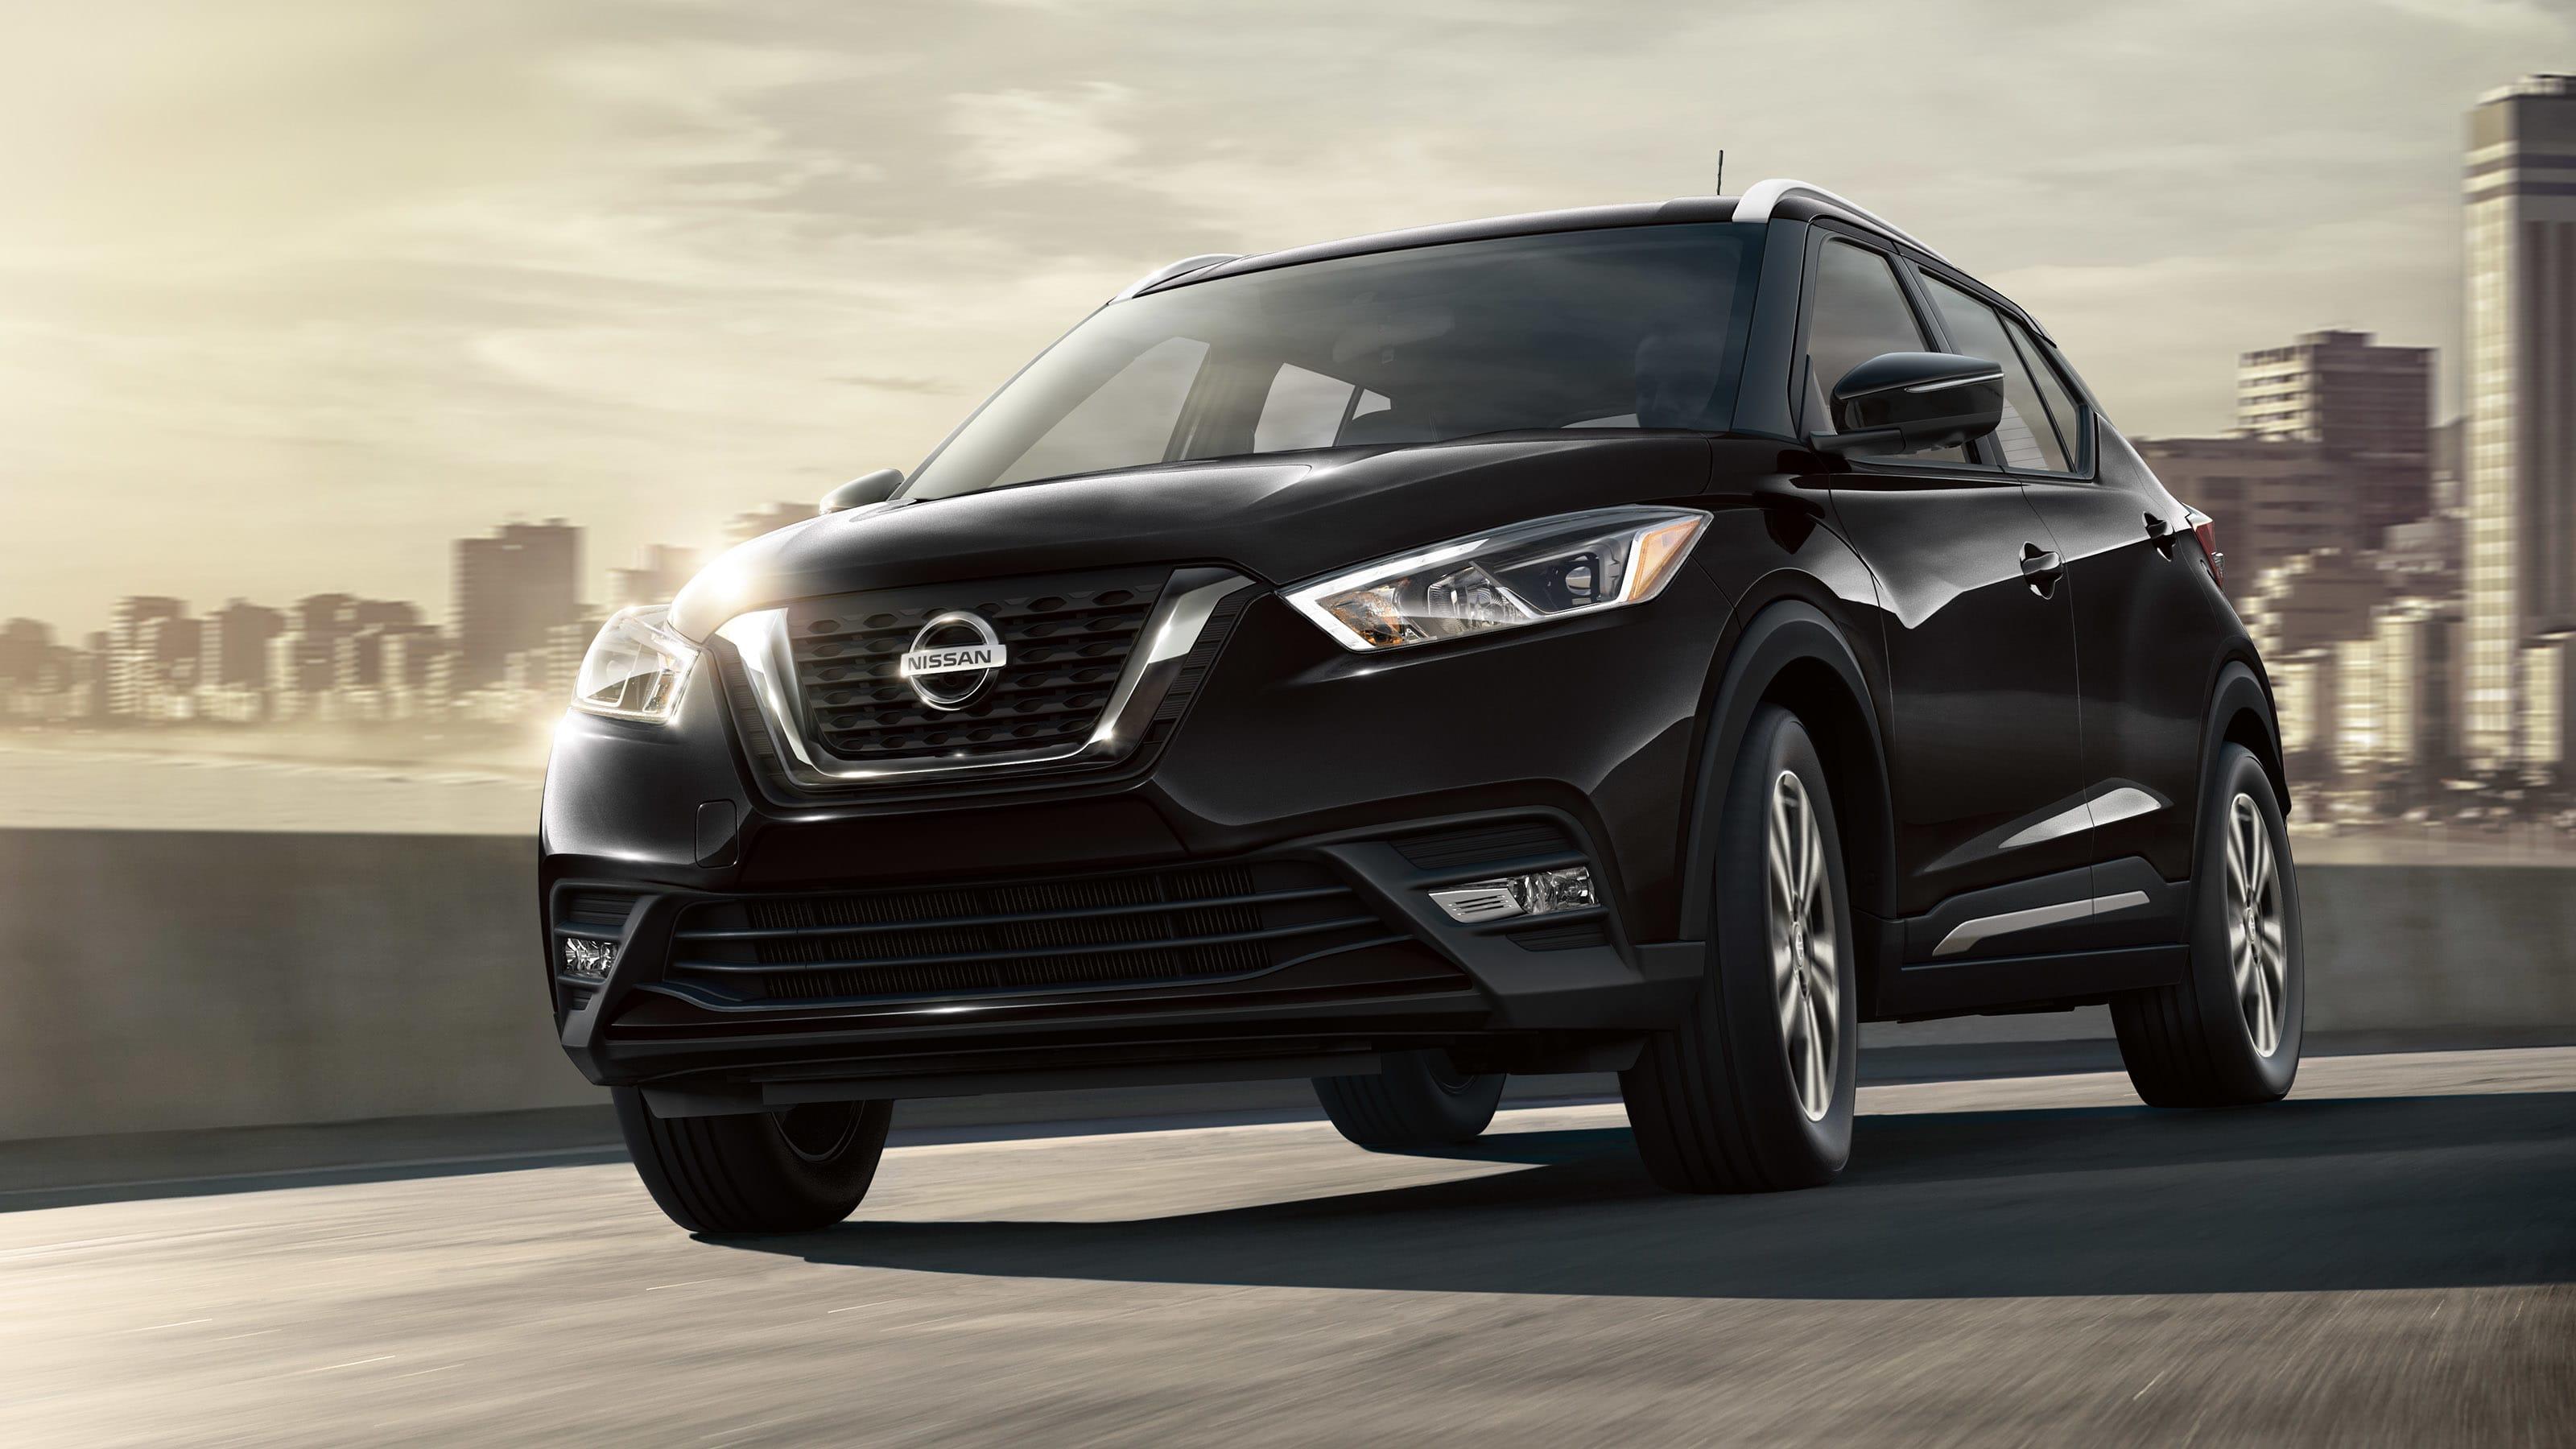 2019 Nissan Kicks Leasing near Washington, DC